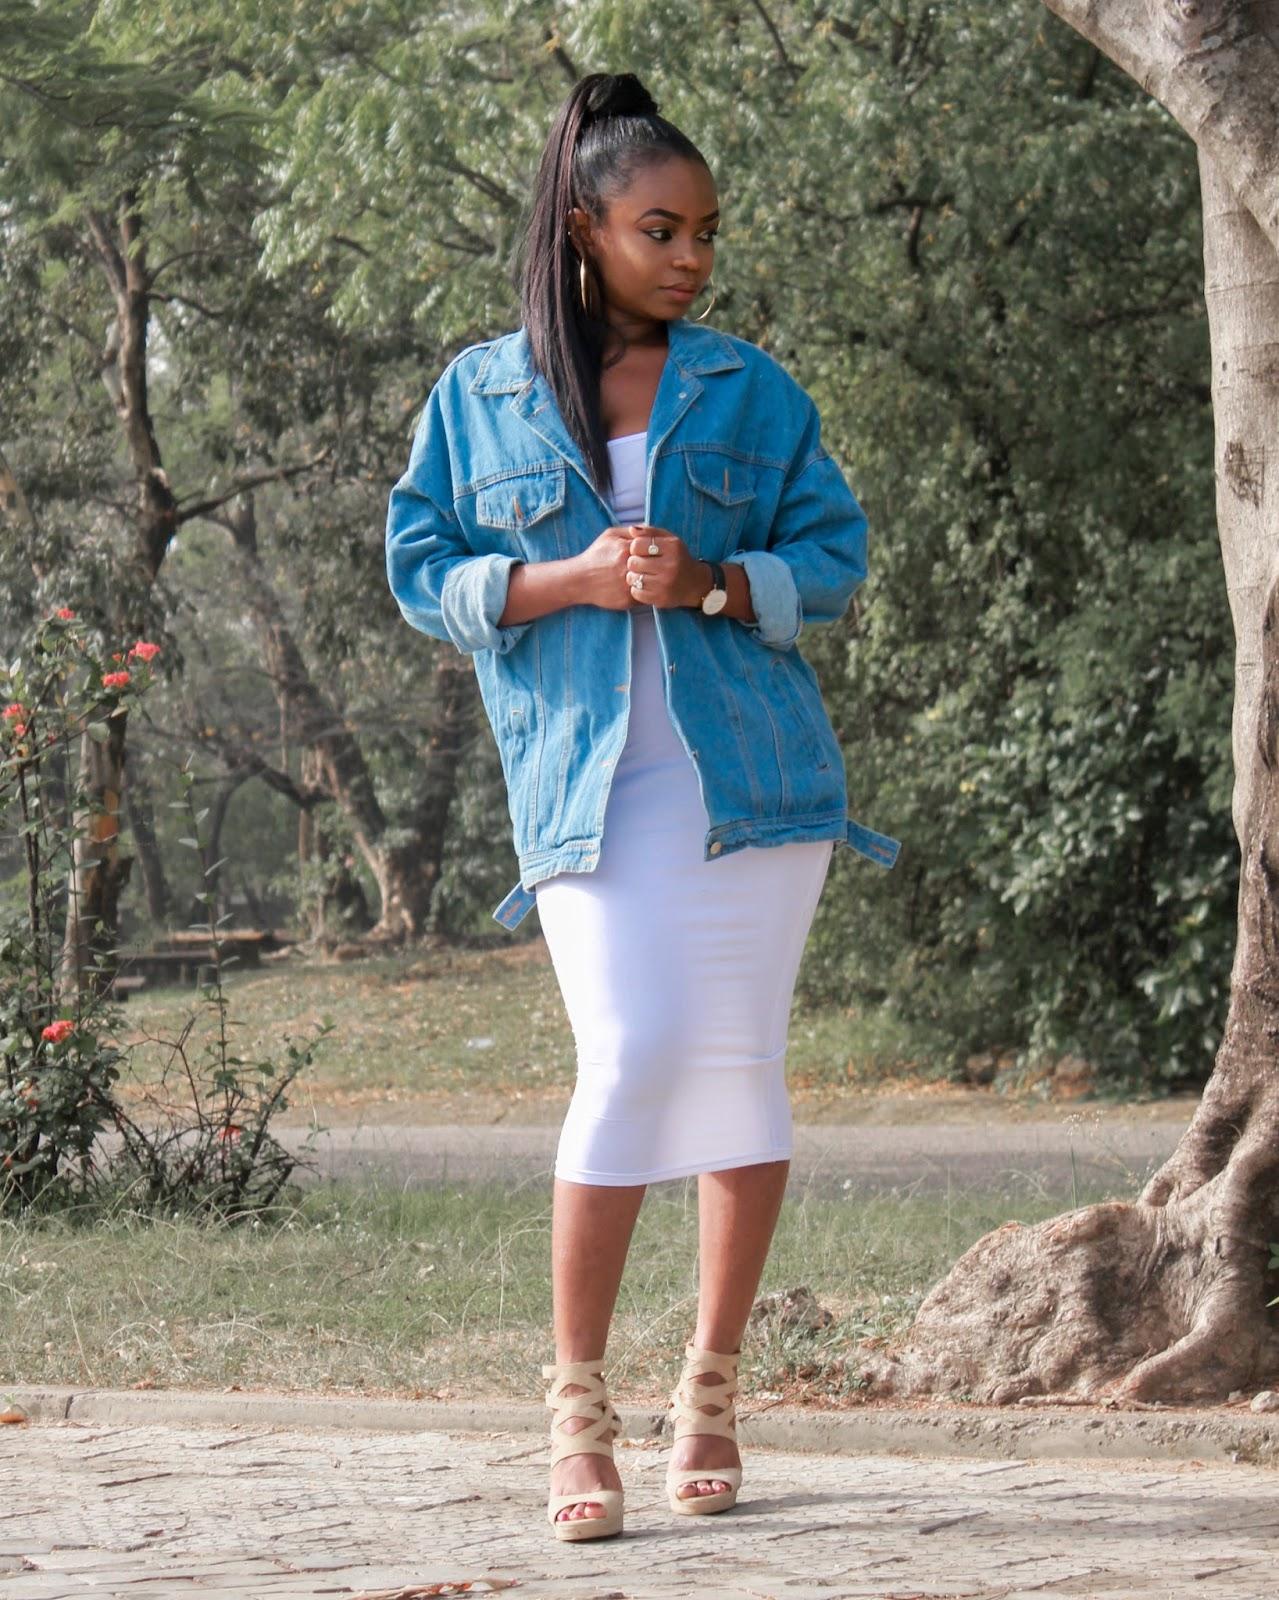 OVERSIZED DENIM JACKET - Romwe Oversized Denim Jacket with DressLily white bodycon